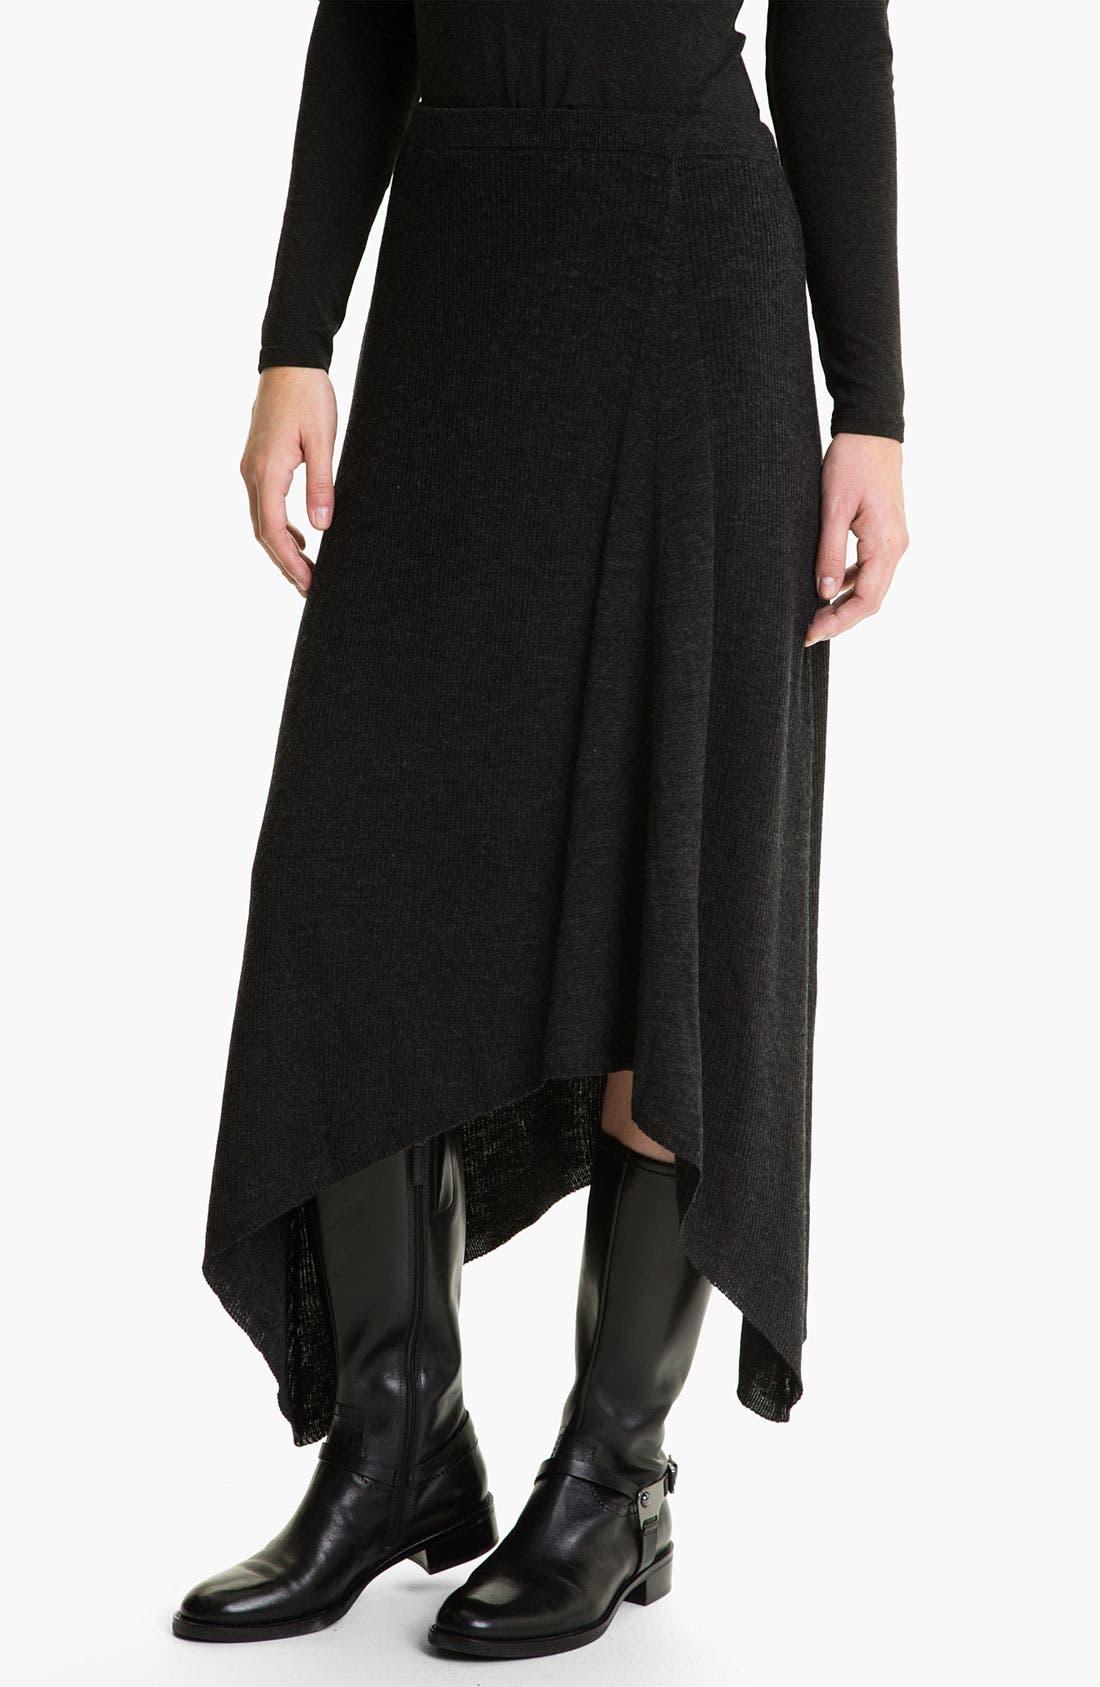 Alternate Image 1 Selected - Eileen Fisher Merino Jersey Rib Knit Skirt